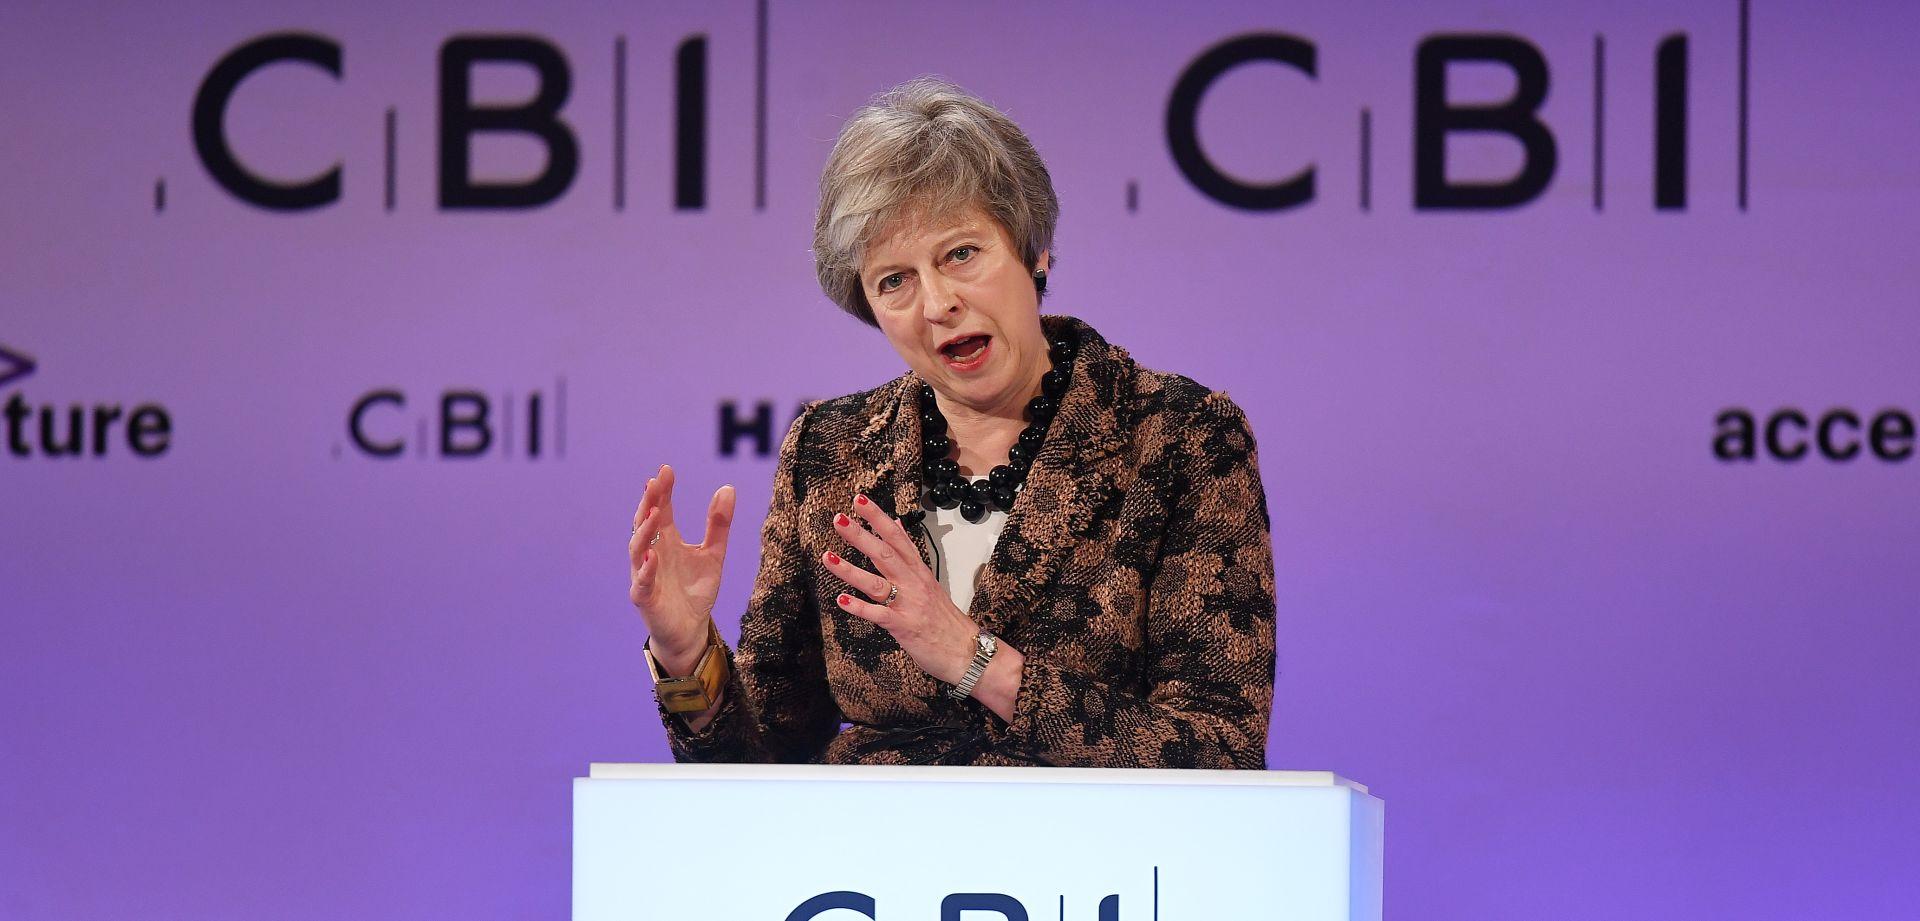 May danas u Bruxellesu želi riješiti sporne točke Brexita